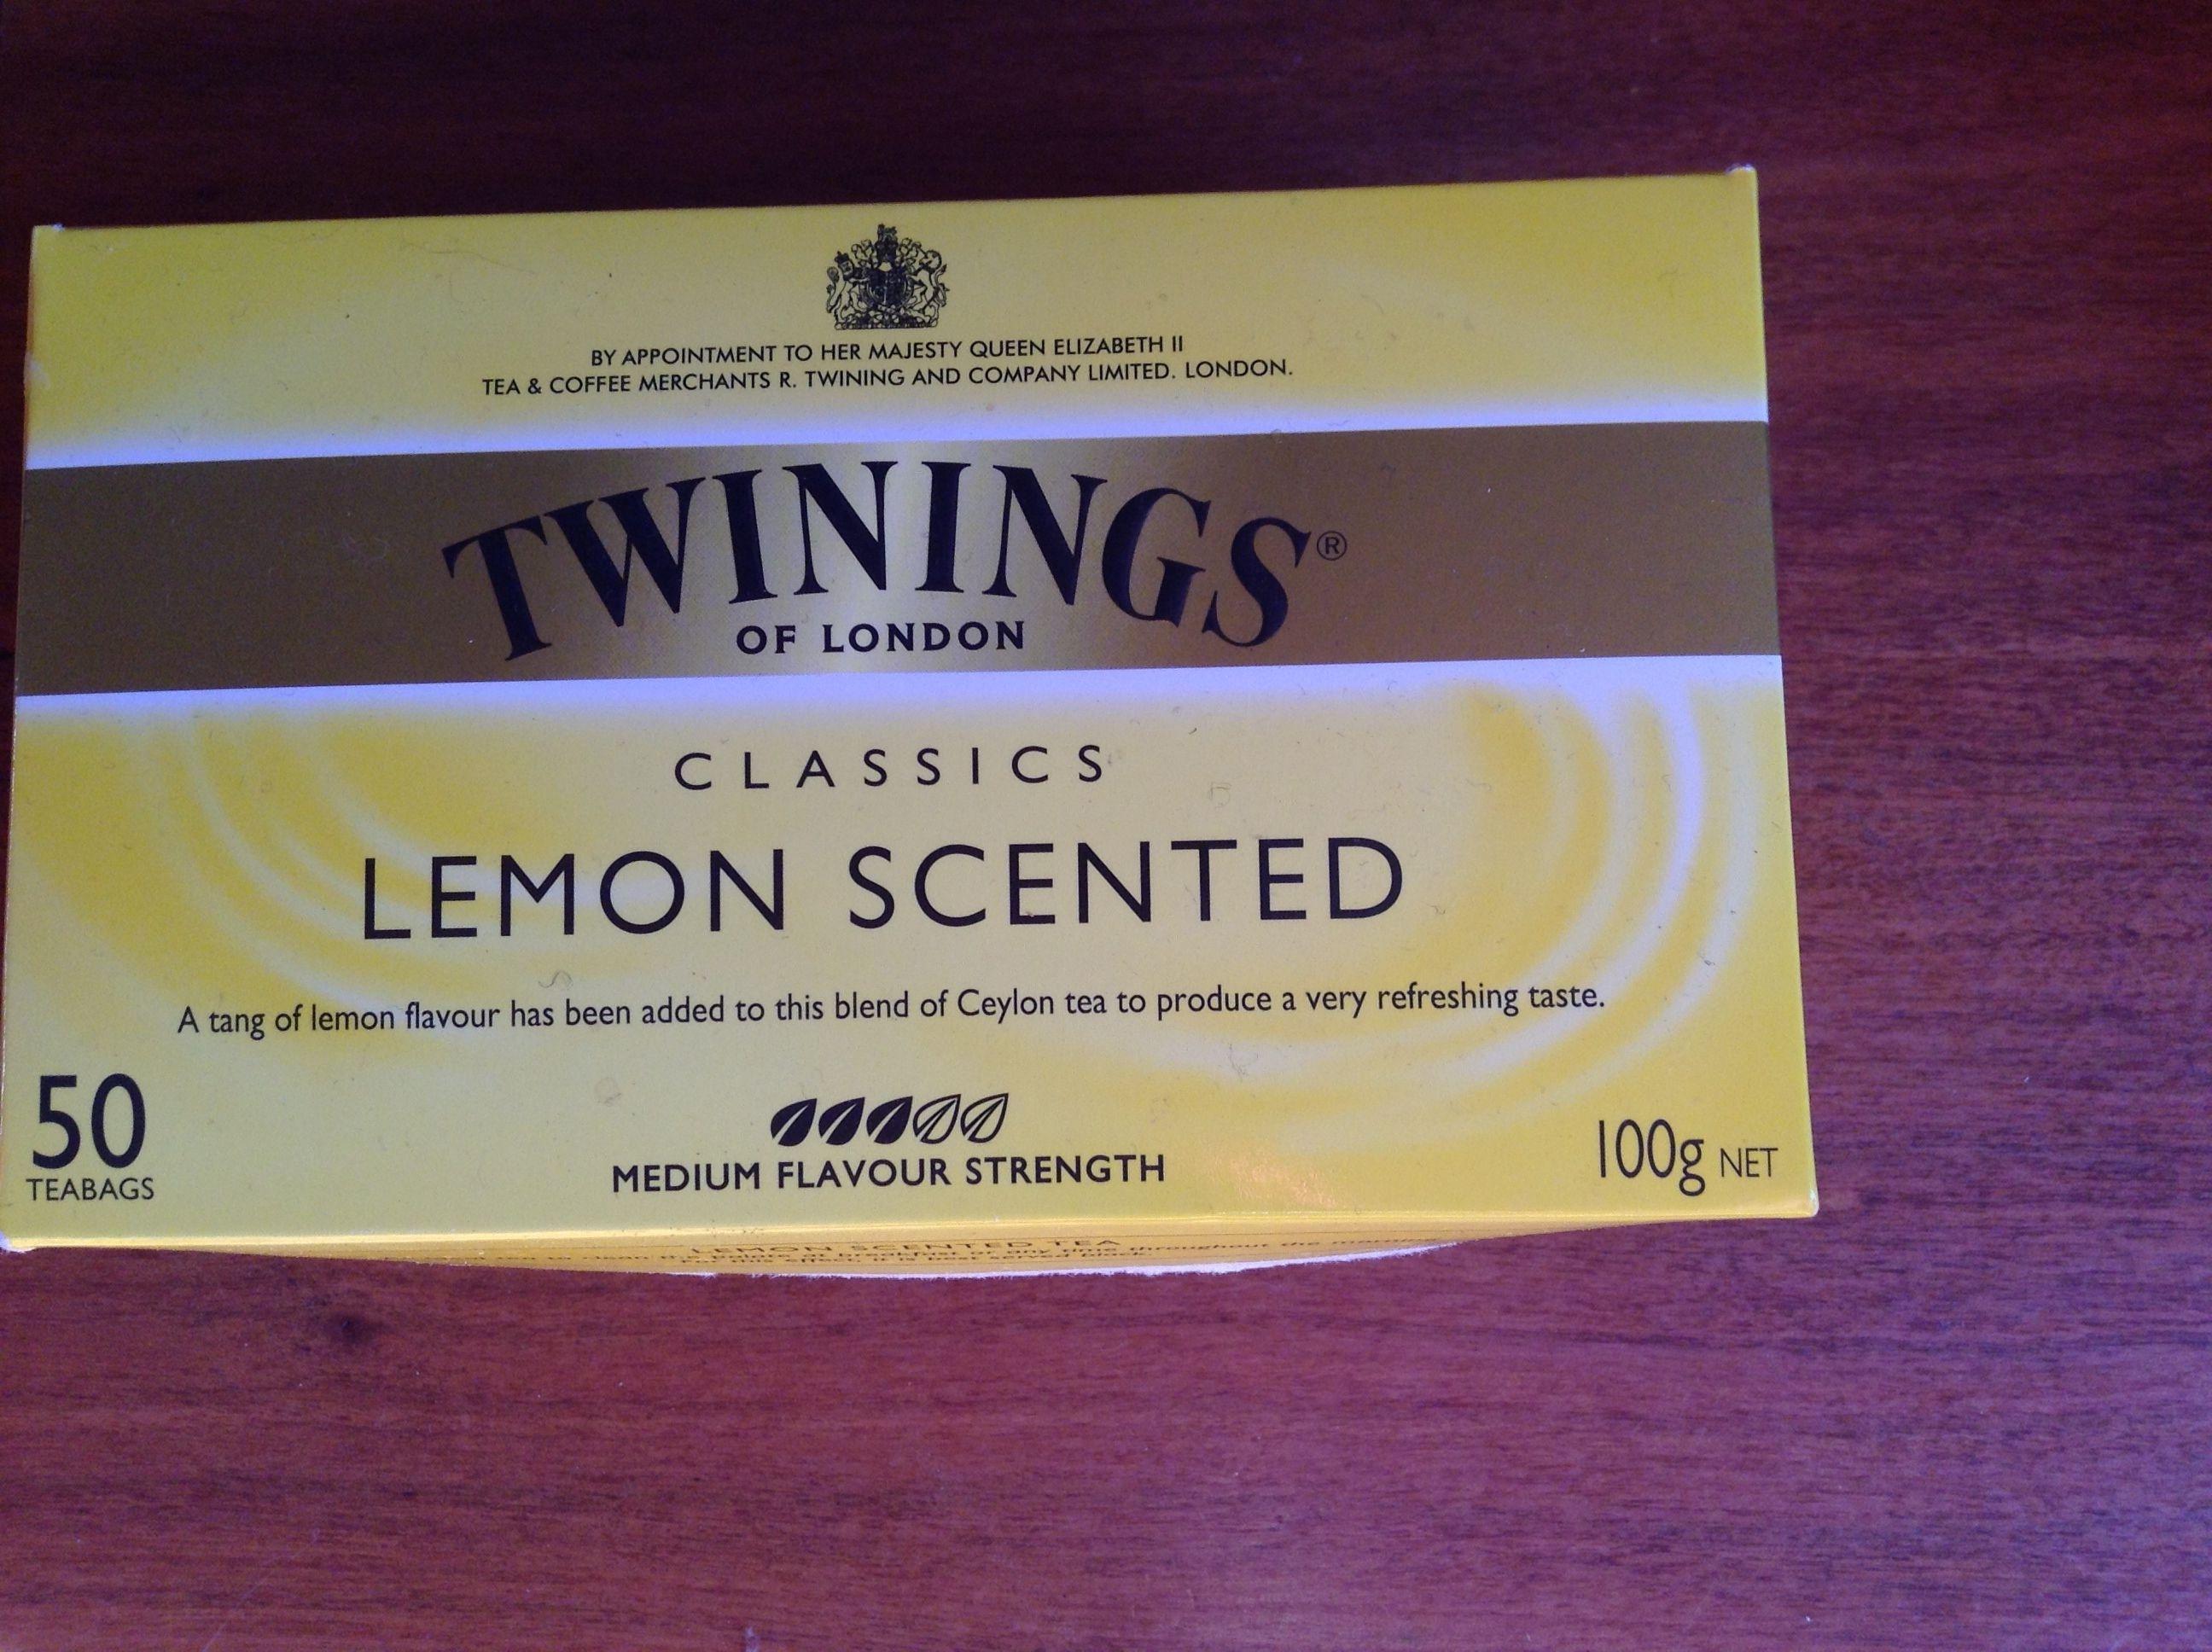 Classic Lemon Scented Medium Flavour Strength - Product - en